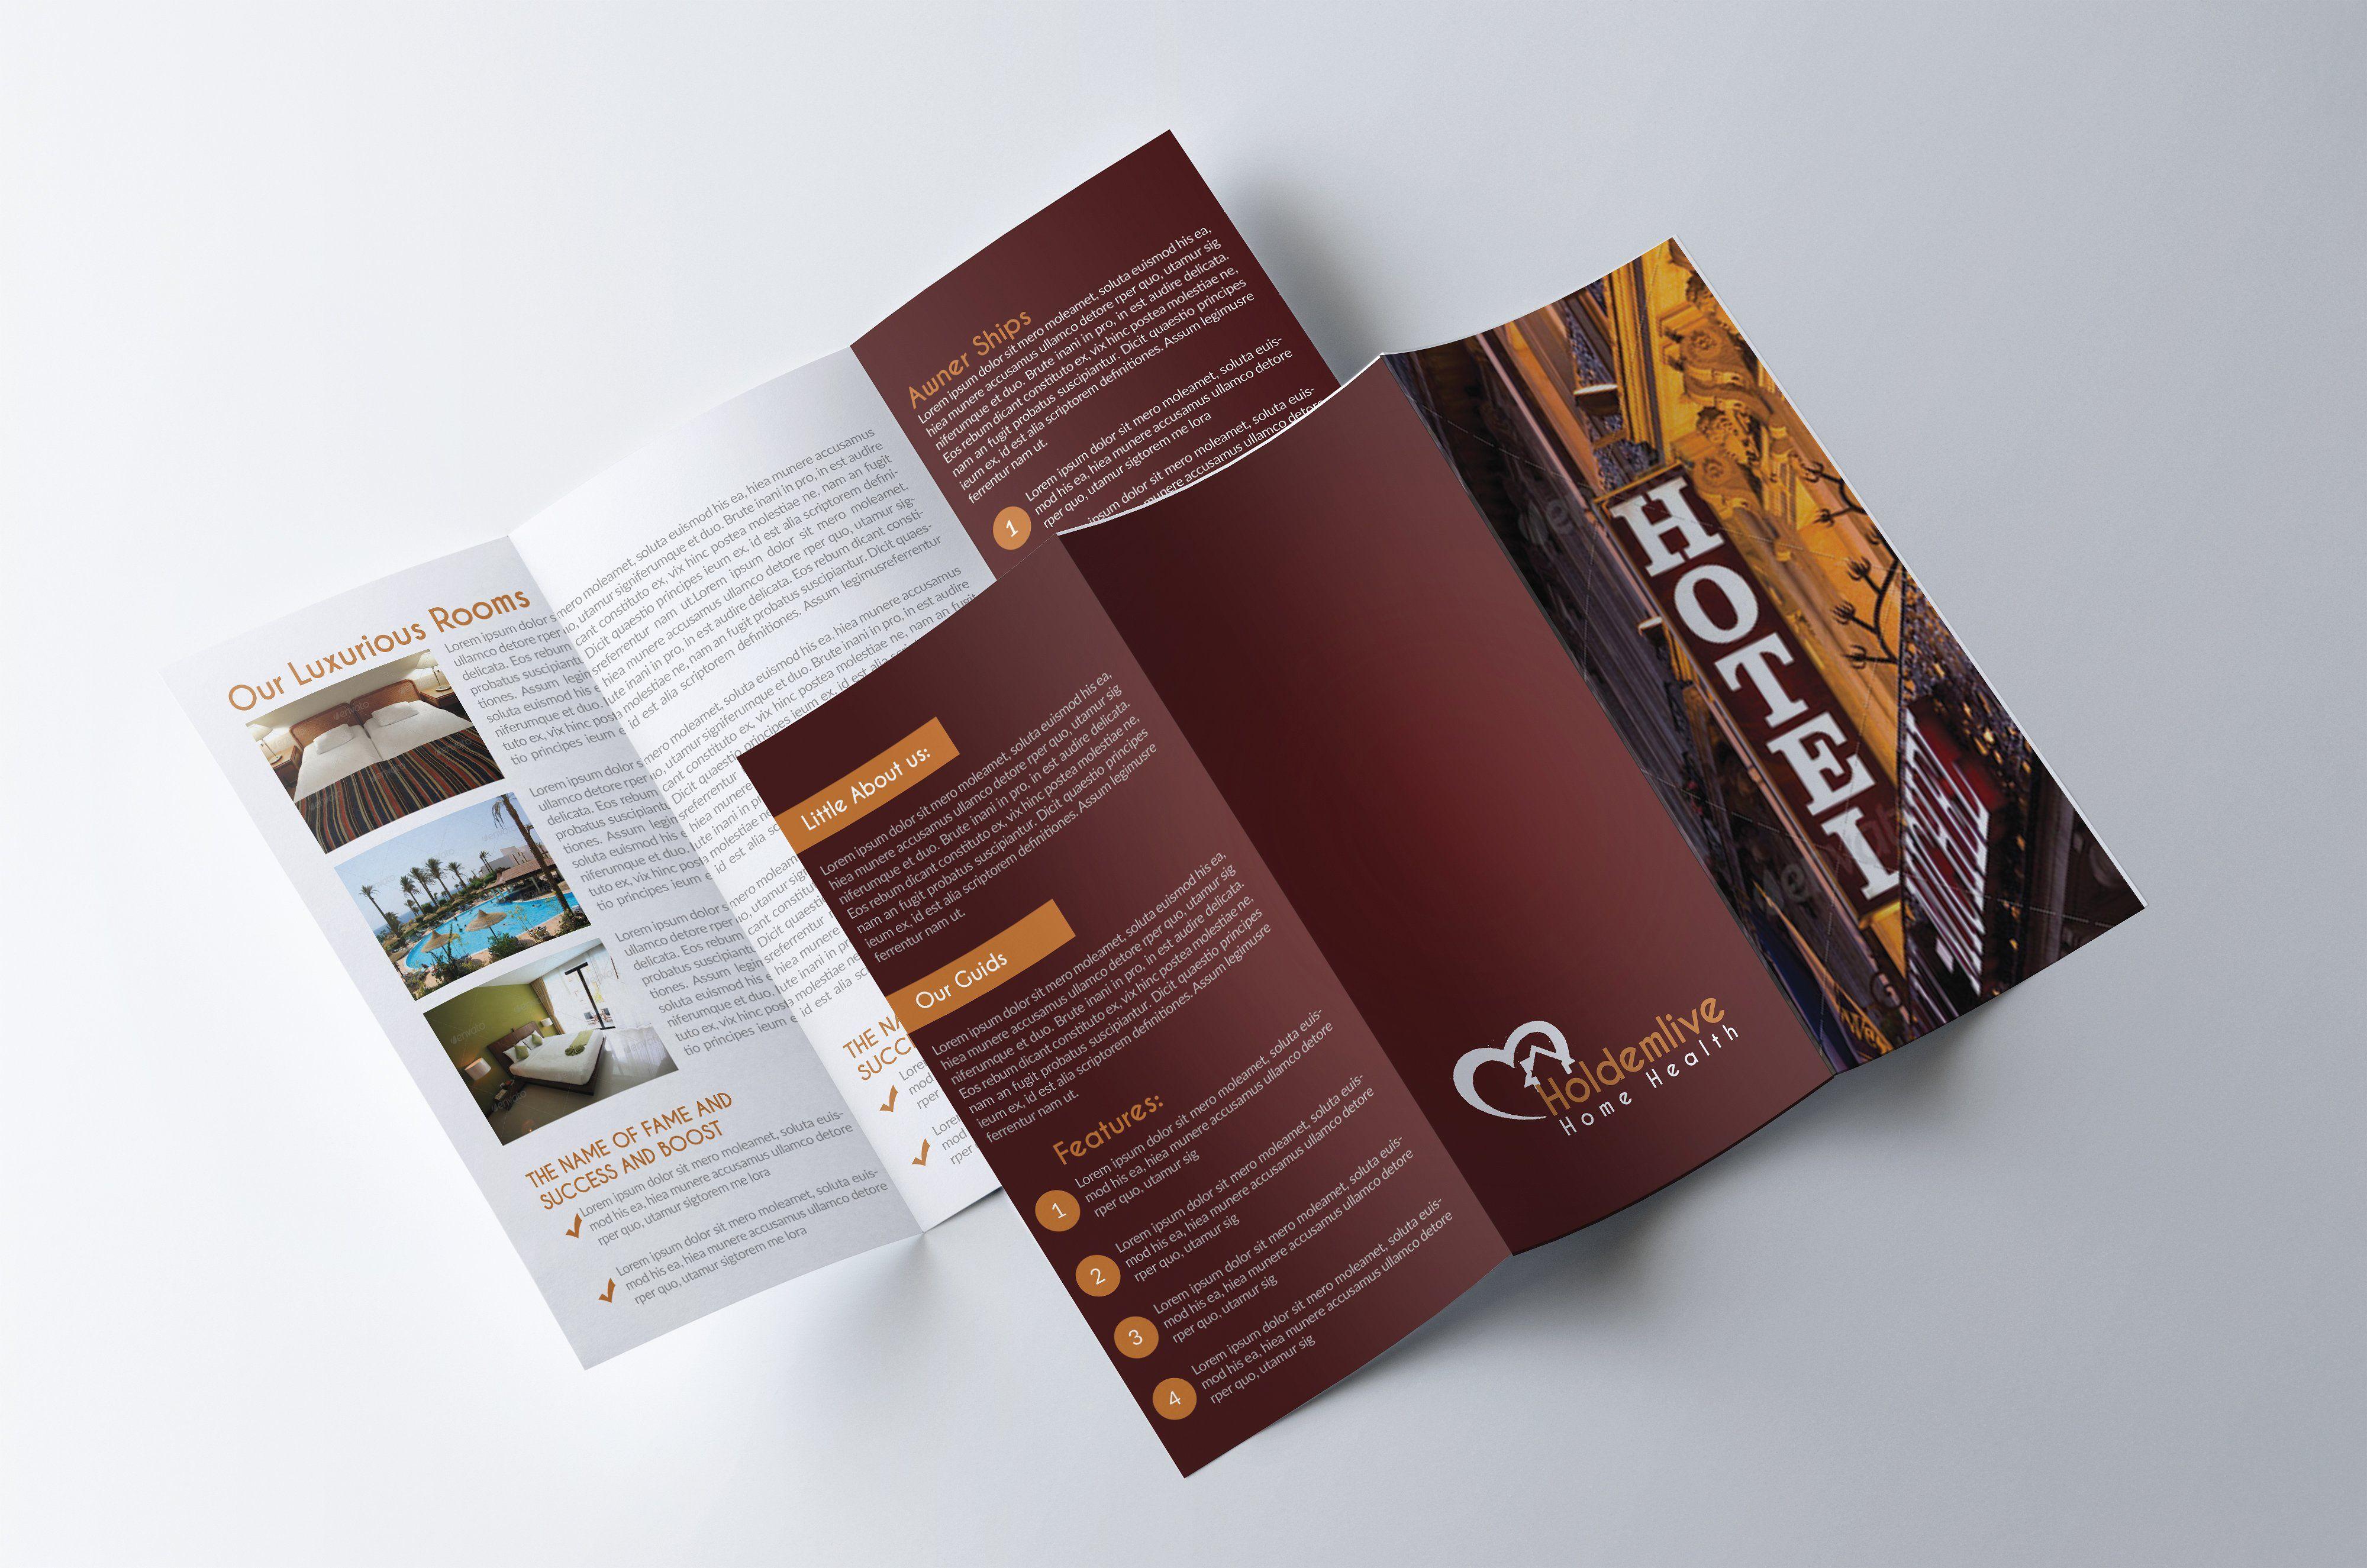 Hotel Trifold Brochure Brochure Design Template Trifold Brochure Design Free Brochure Template